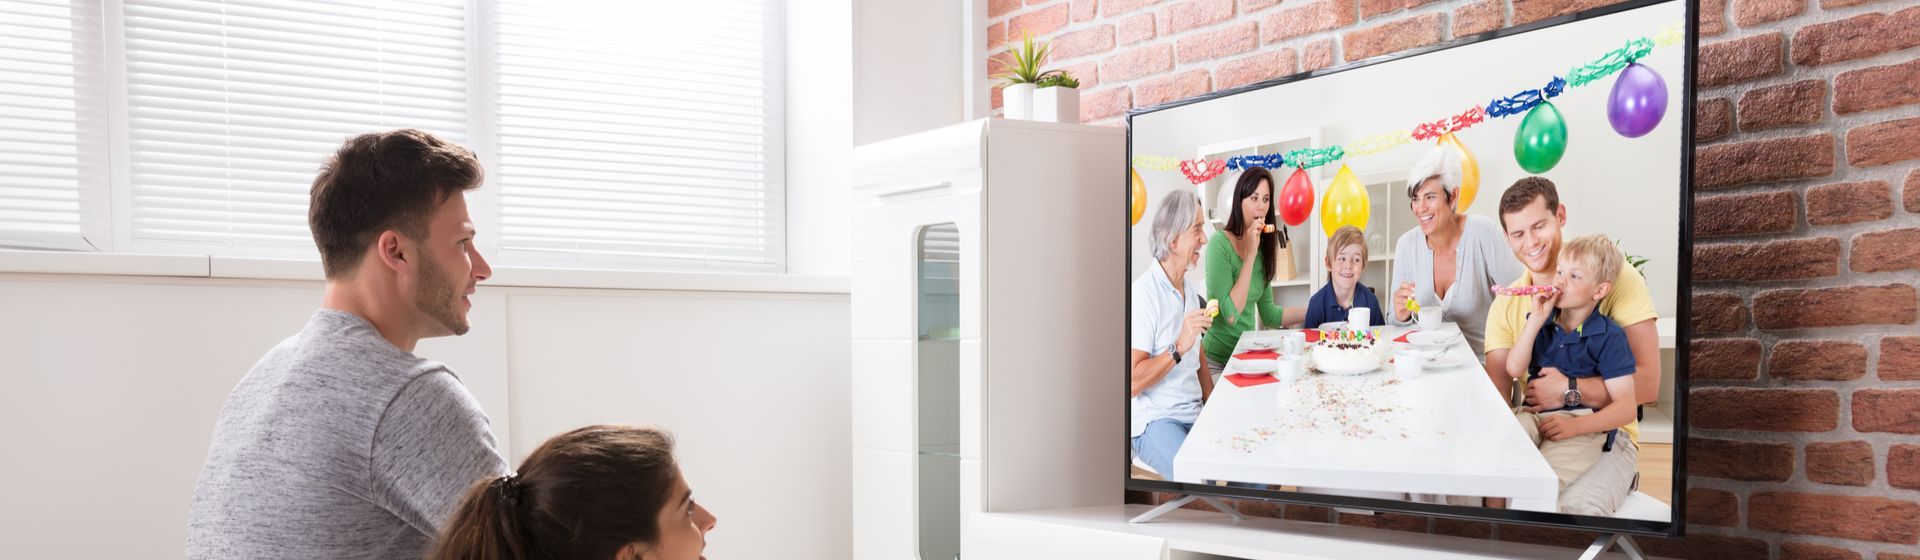 Como medir polegadas da TV?